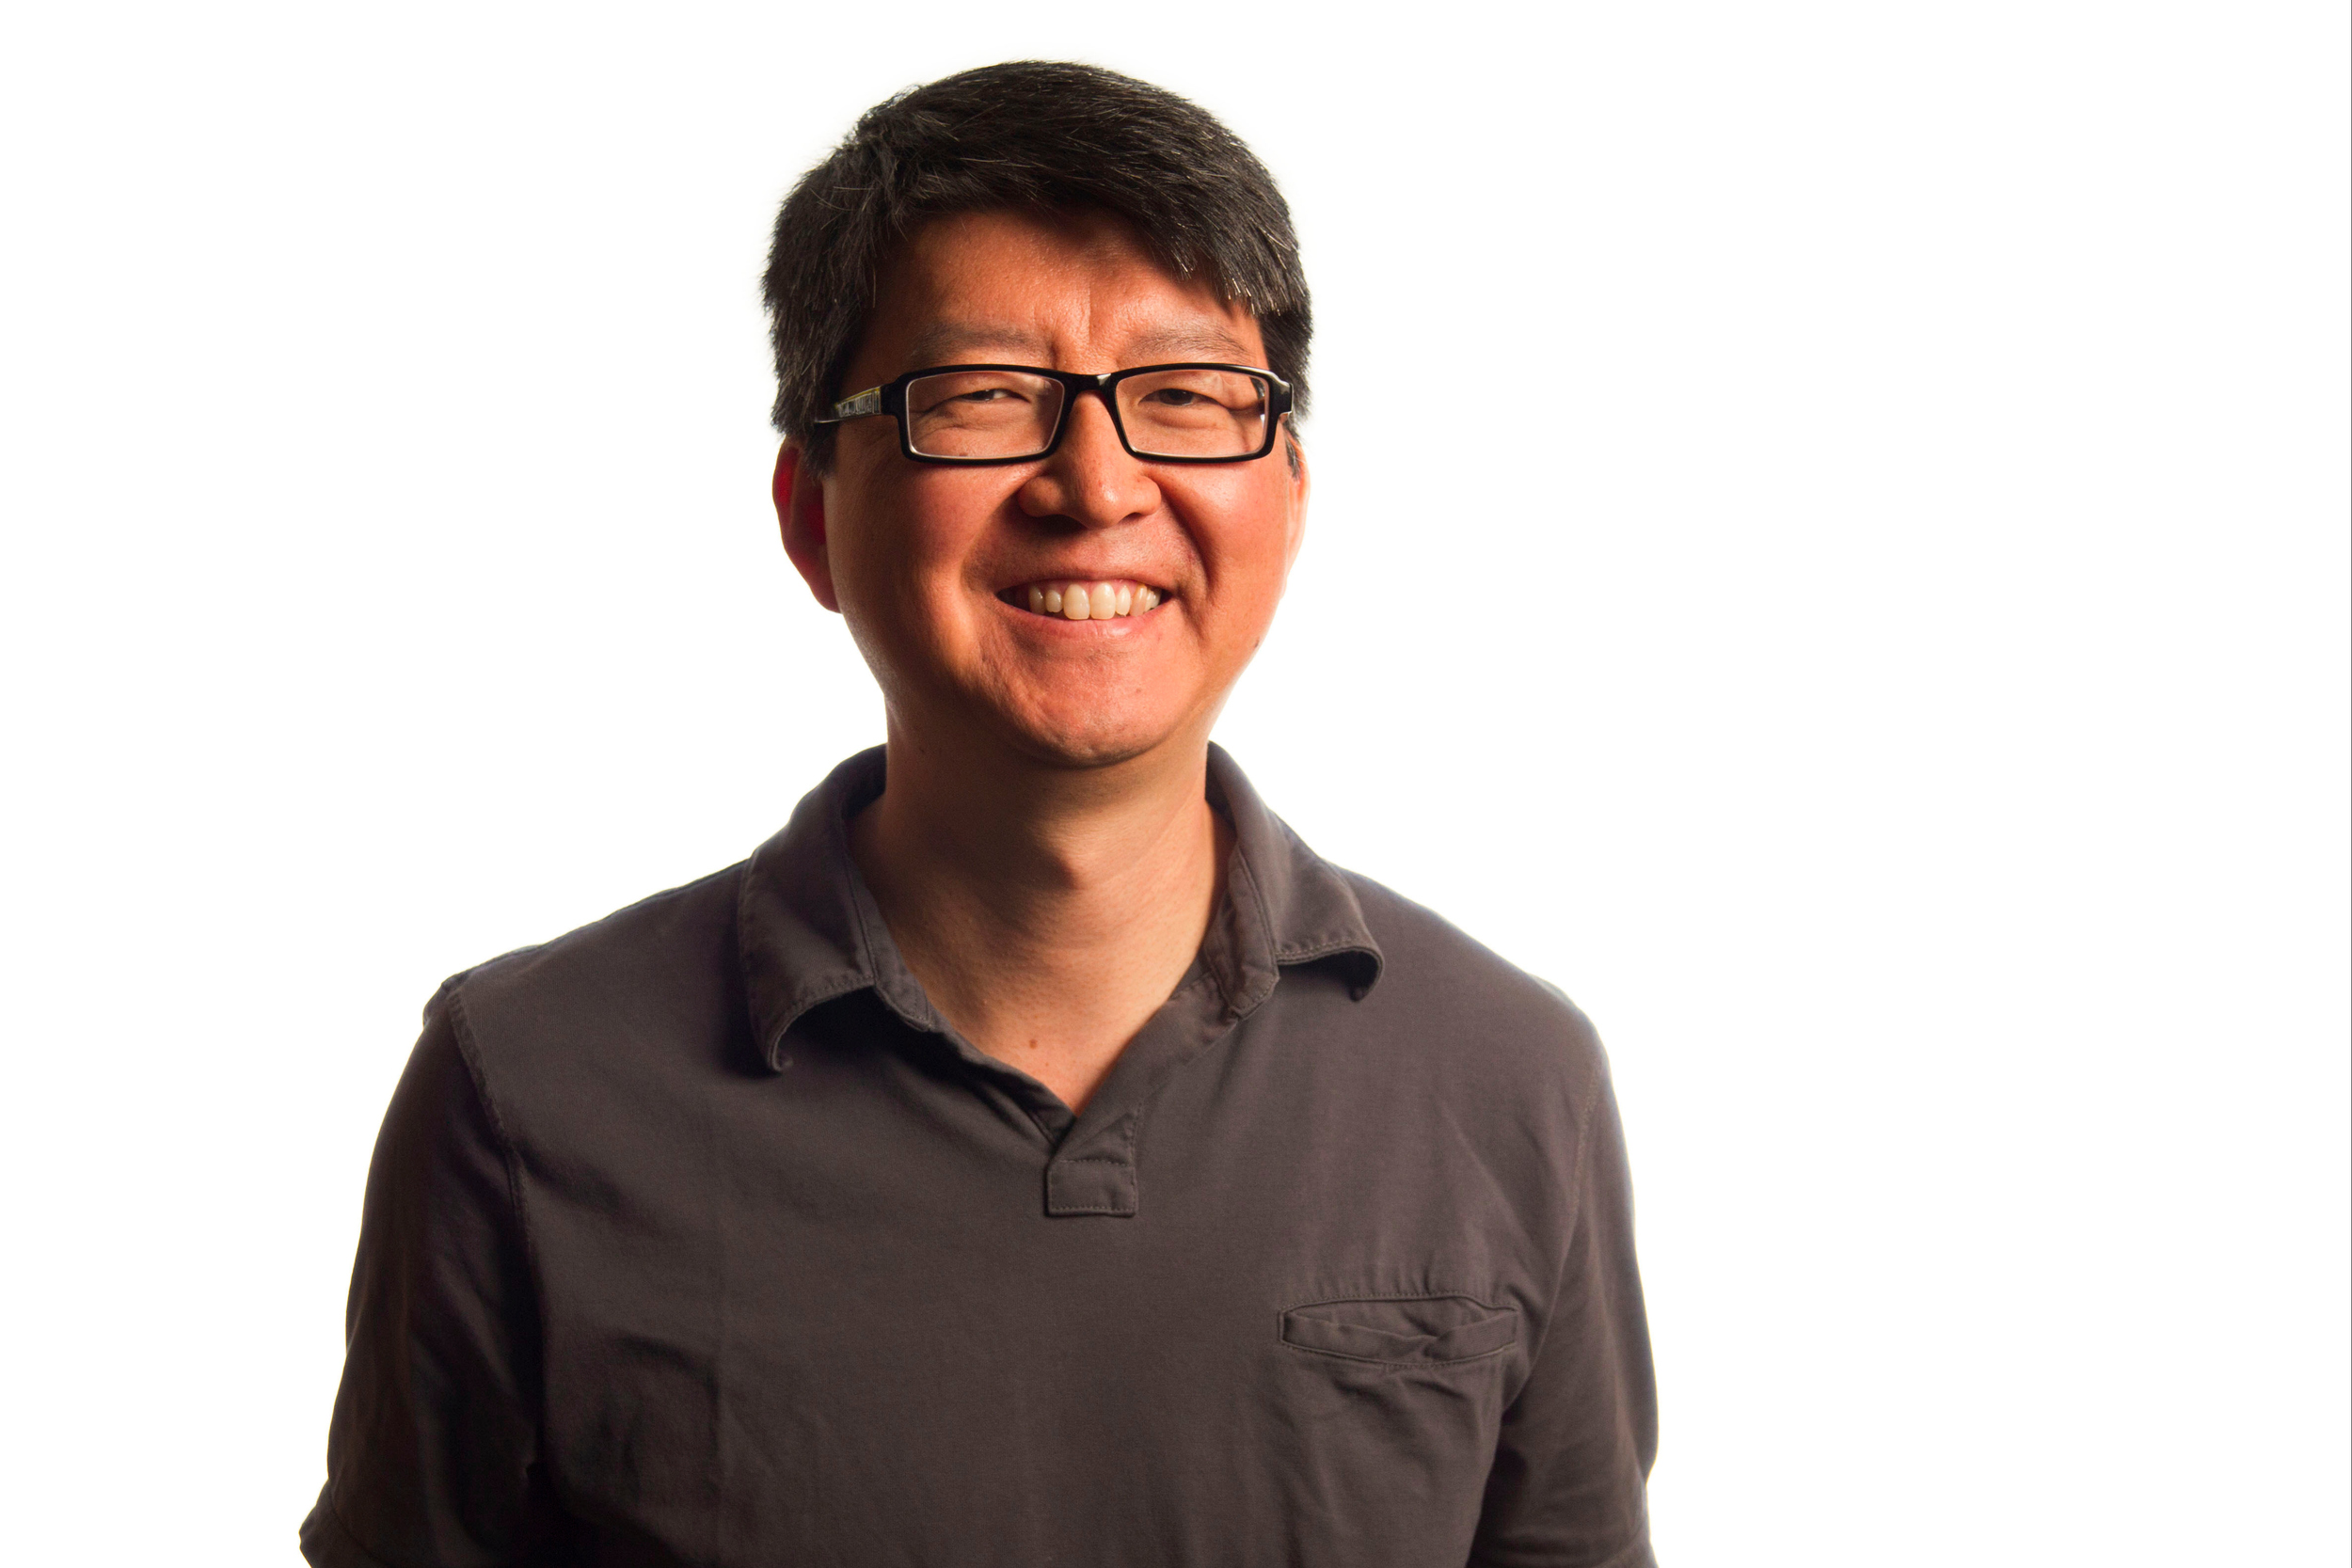 Sung Park, workshop co-director